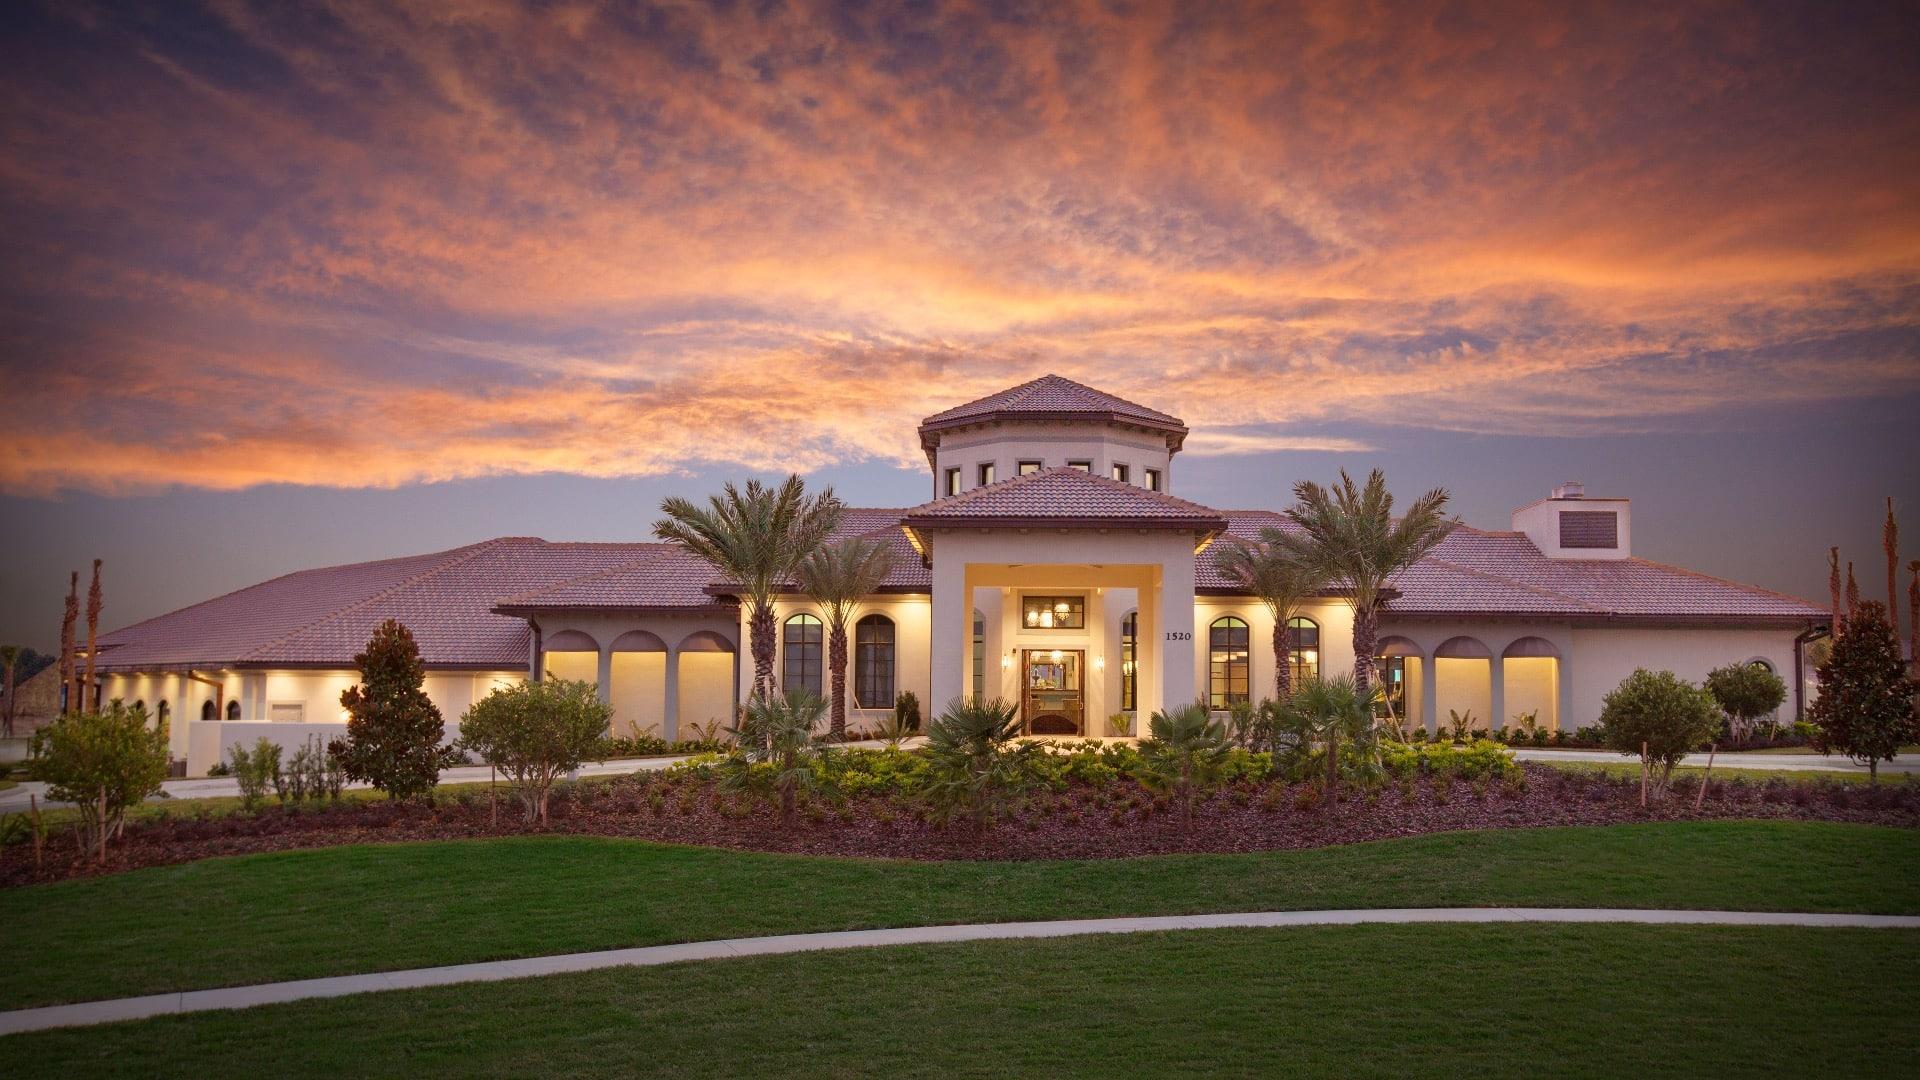 Champions Gate Club house at sunset Davenport